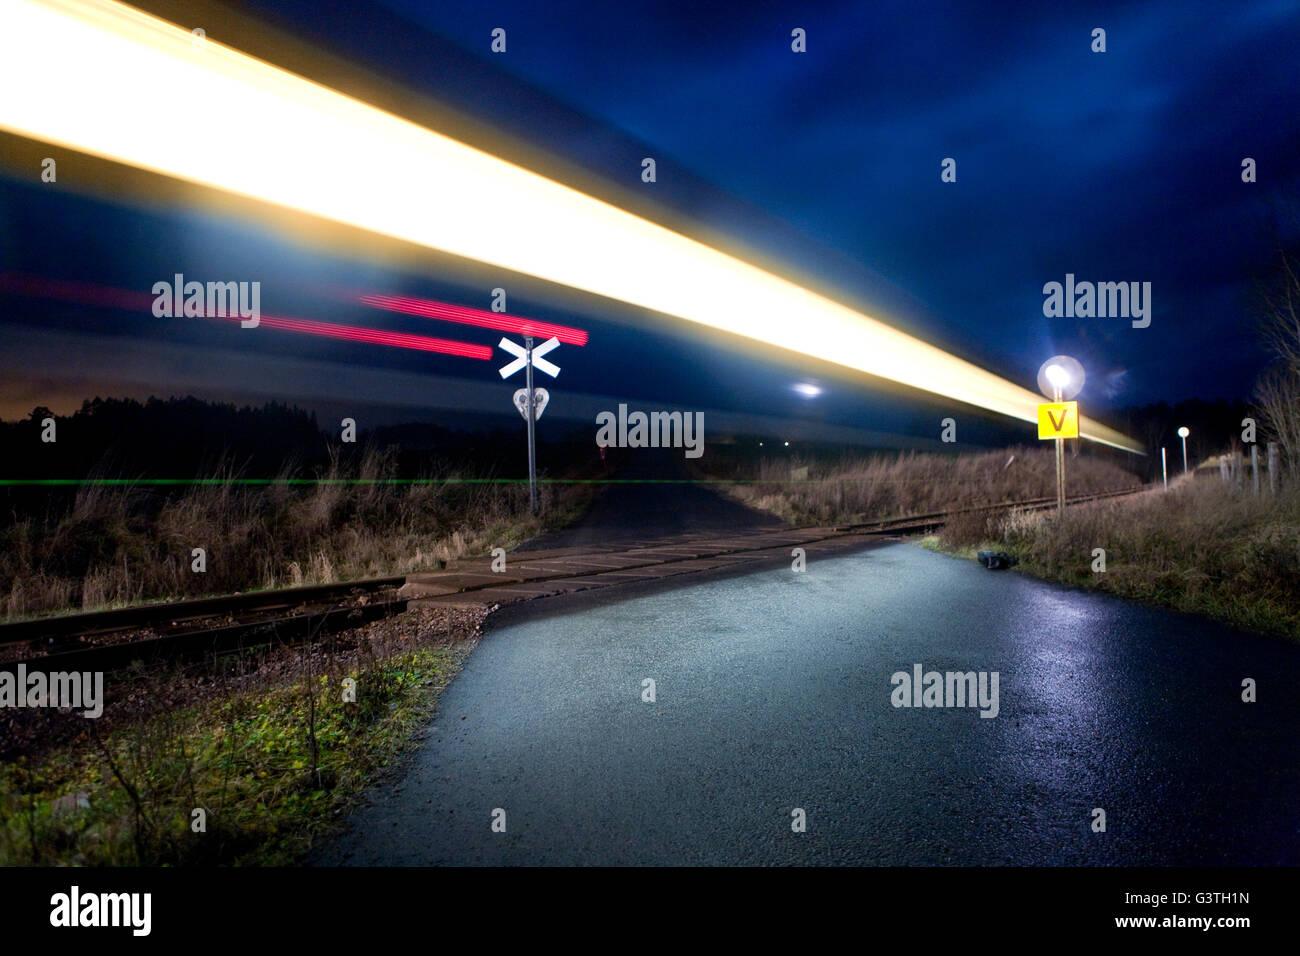 Sweden, Atvidaberg, Falerum, Light trail of passing train - Stock Image